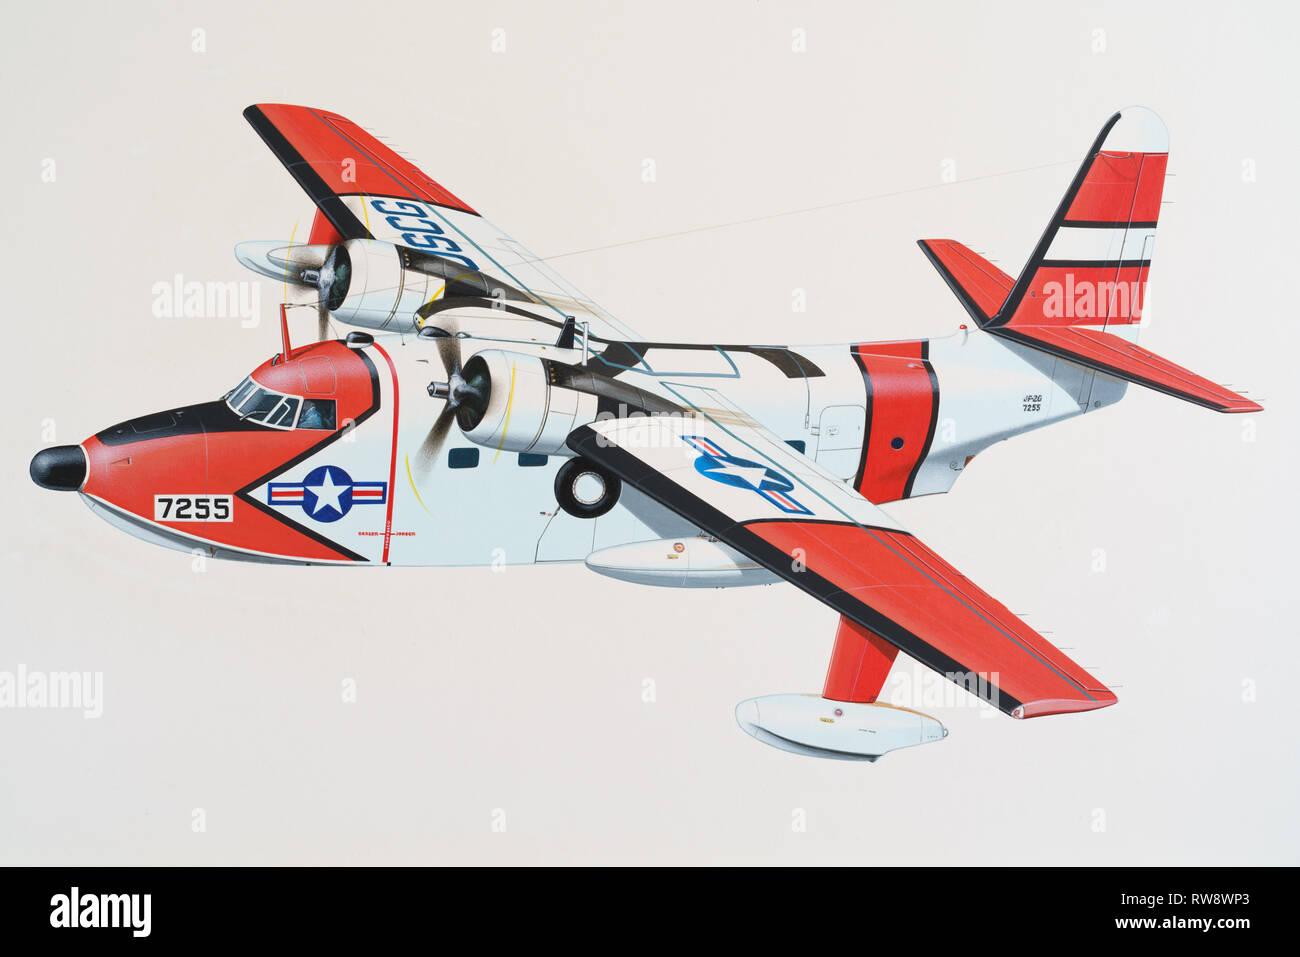 Airplane illustration Stock Photo